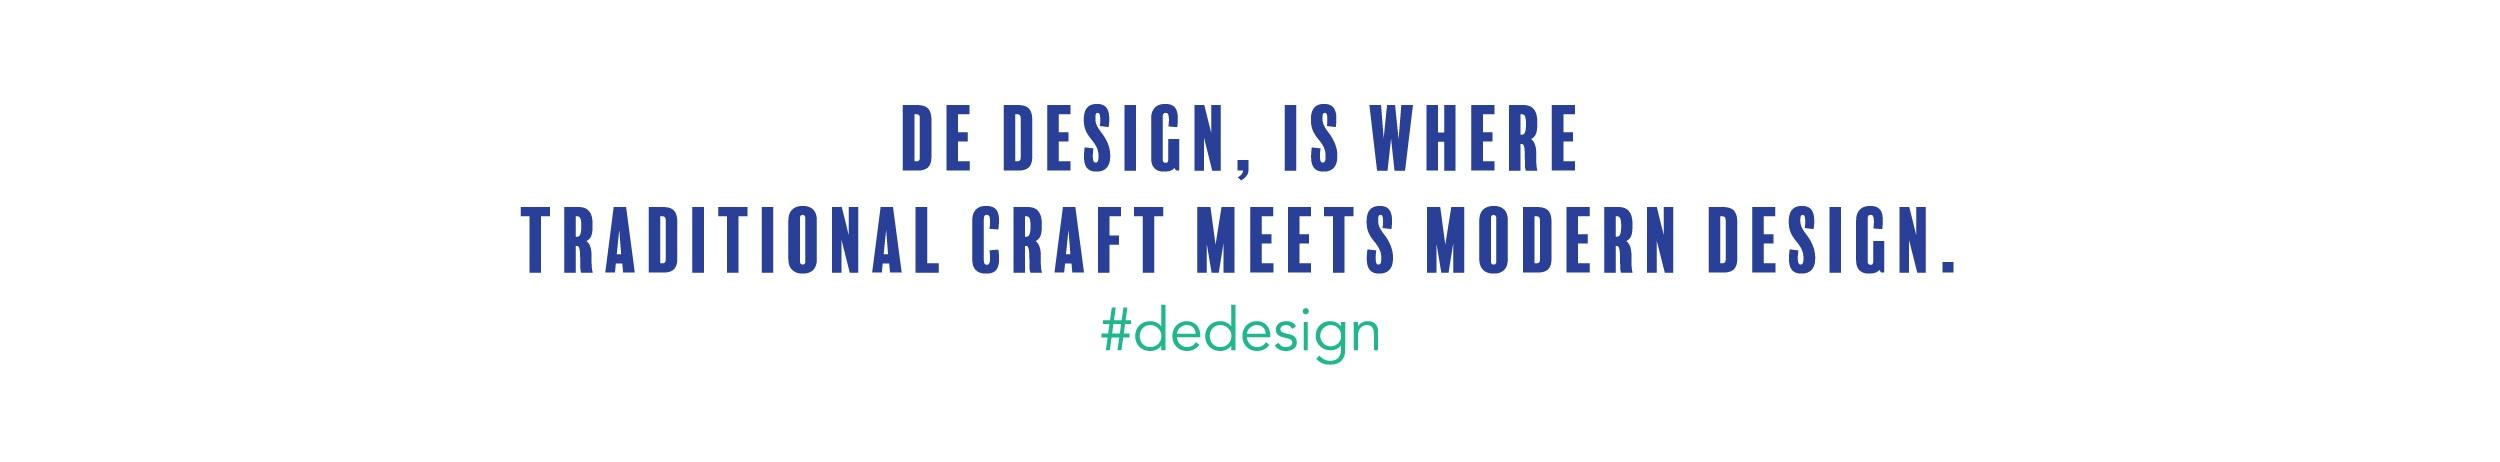 DeDesign_Quote+Bar-DeDesign.jpg